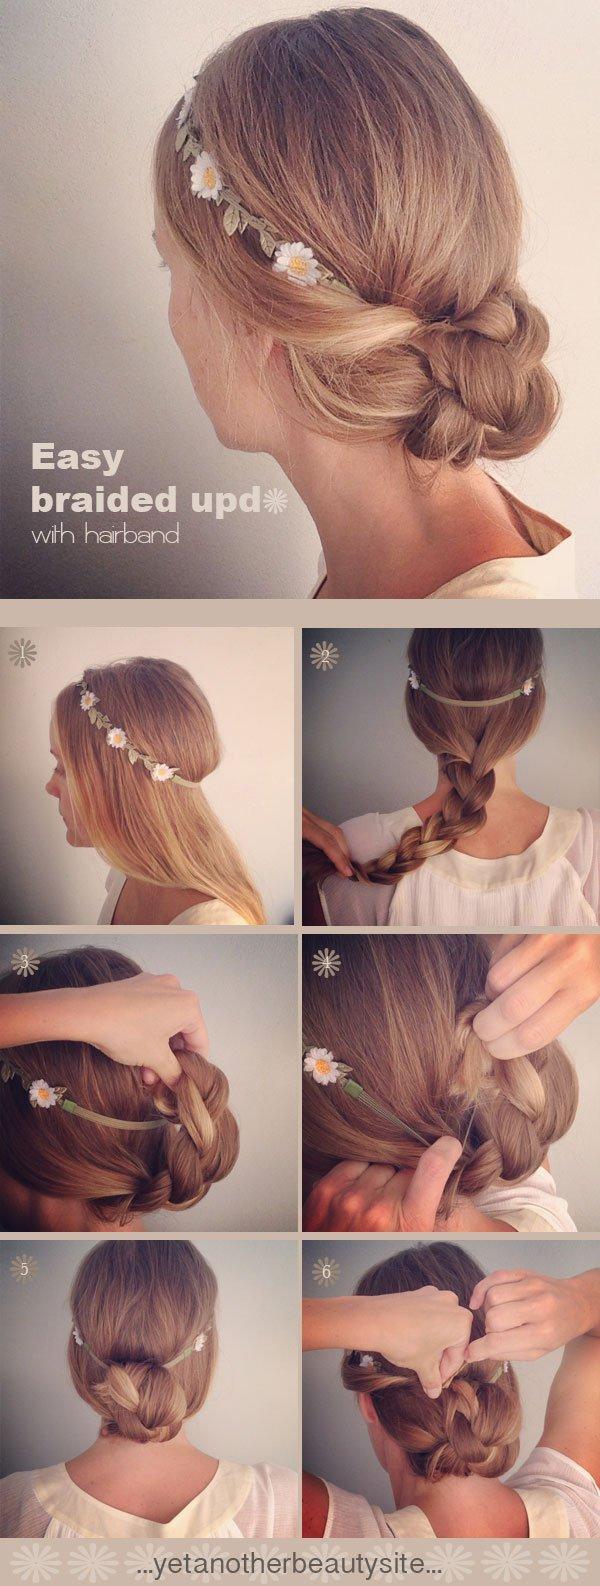 Braided Updo with Headband